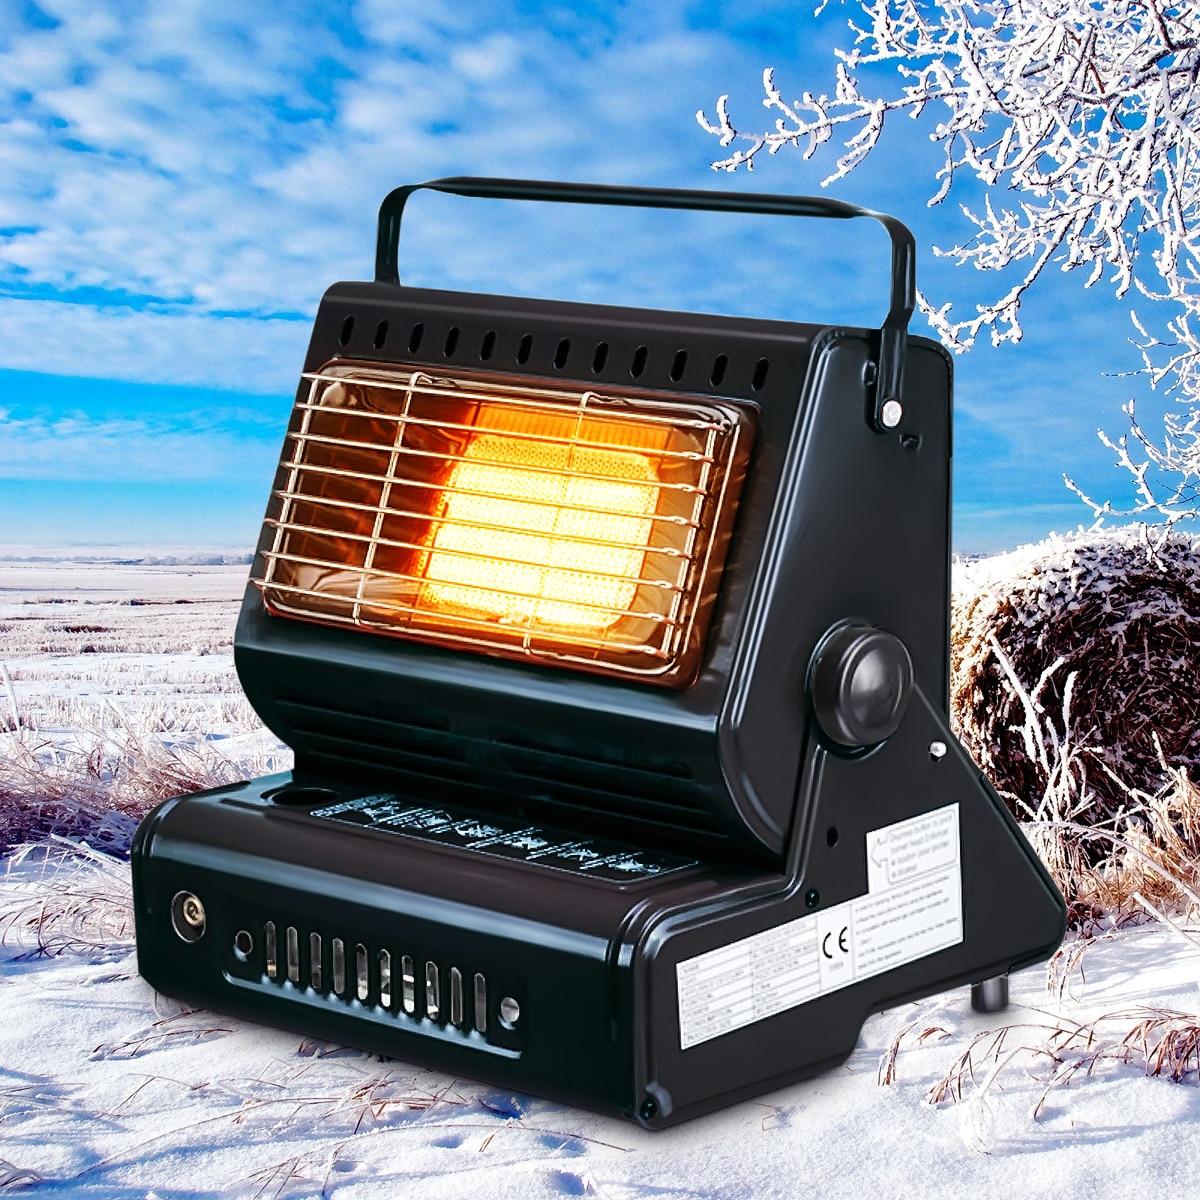 Outdoor Heat Cooker Aluminum Alloy Portable Outdoor Stove ...